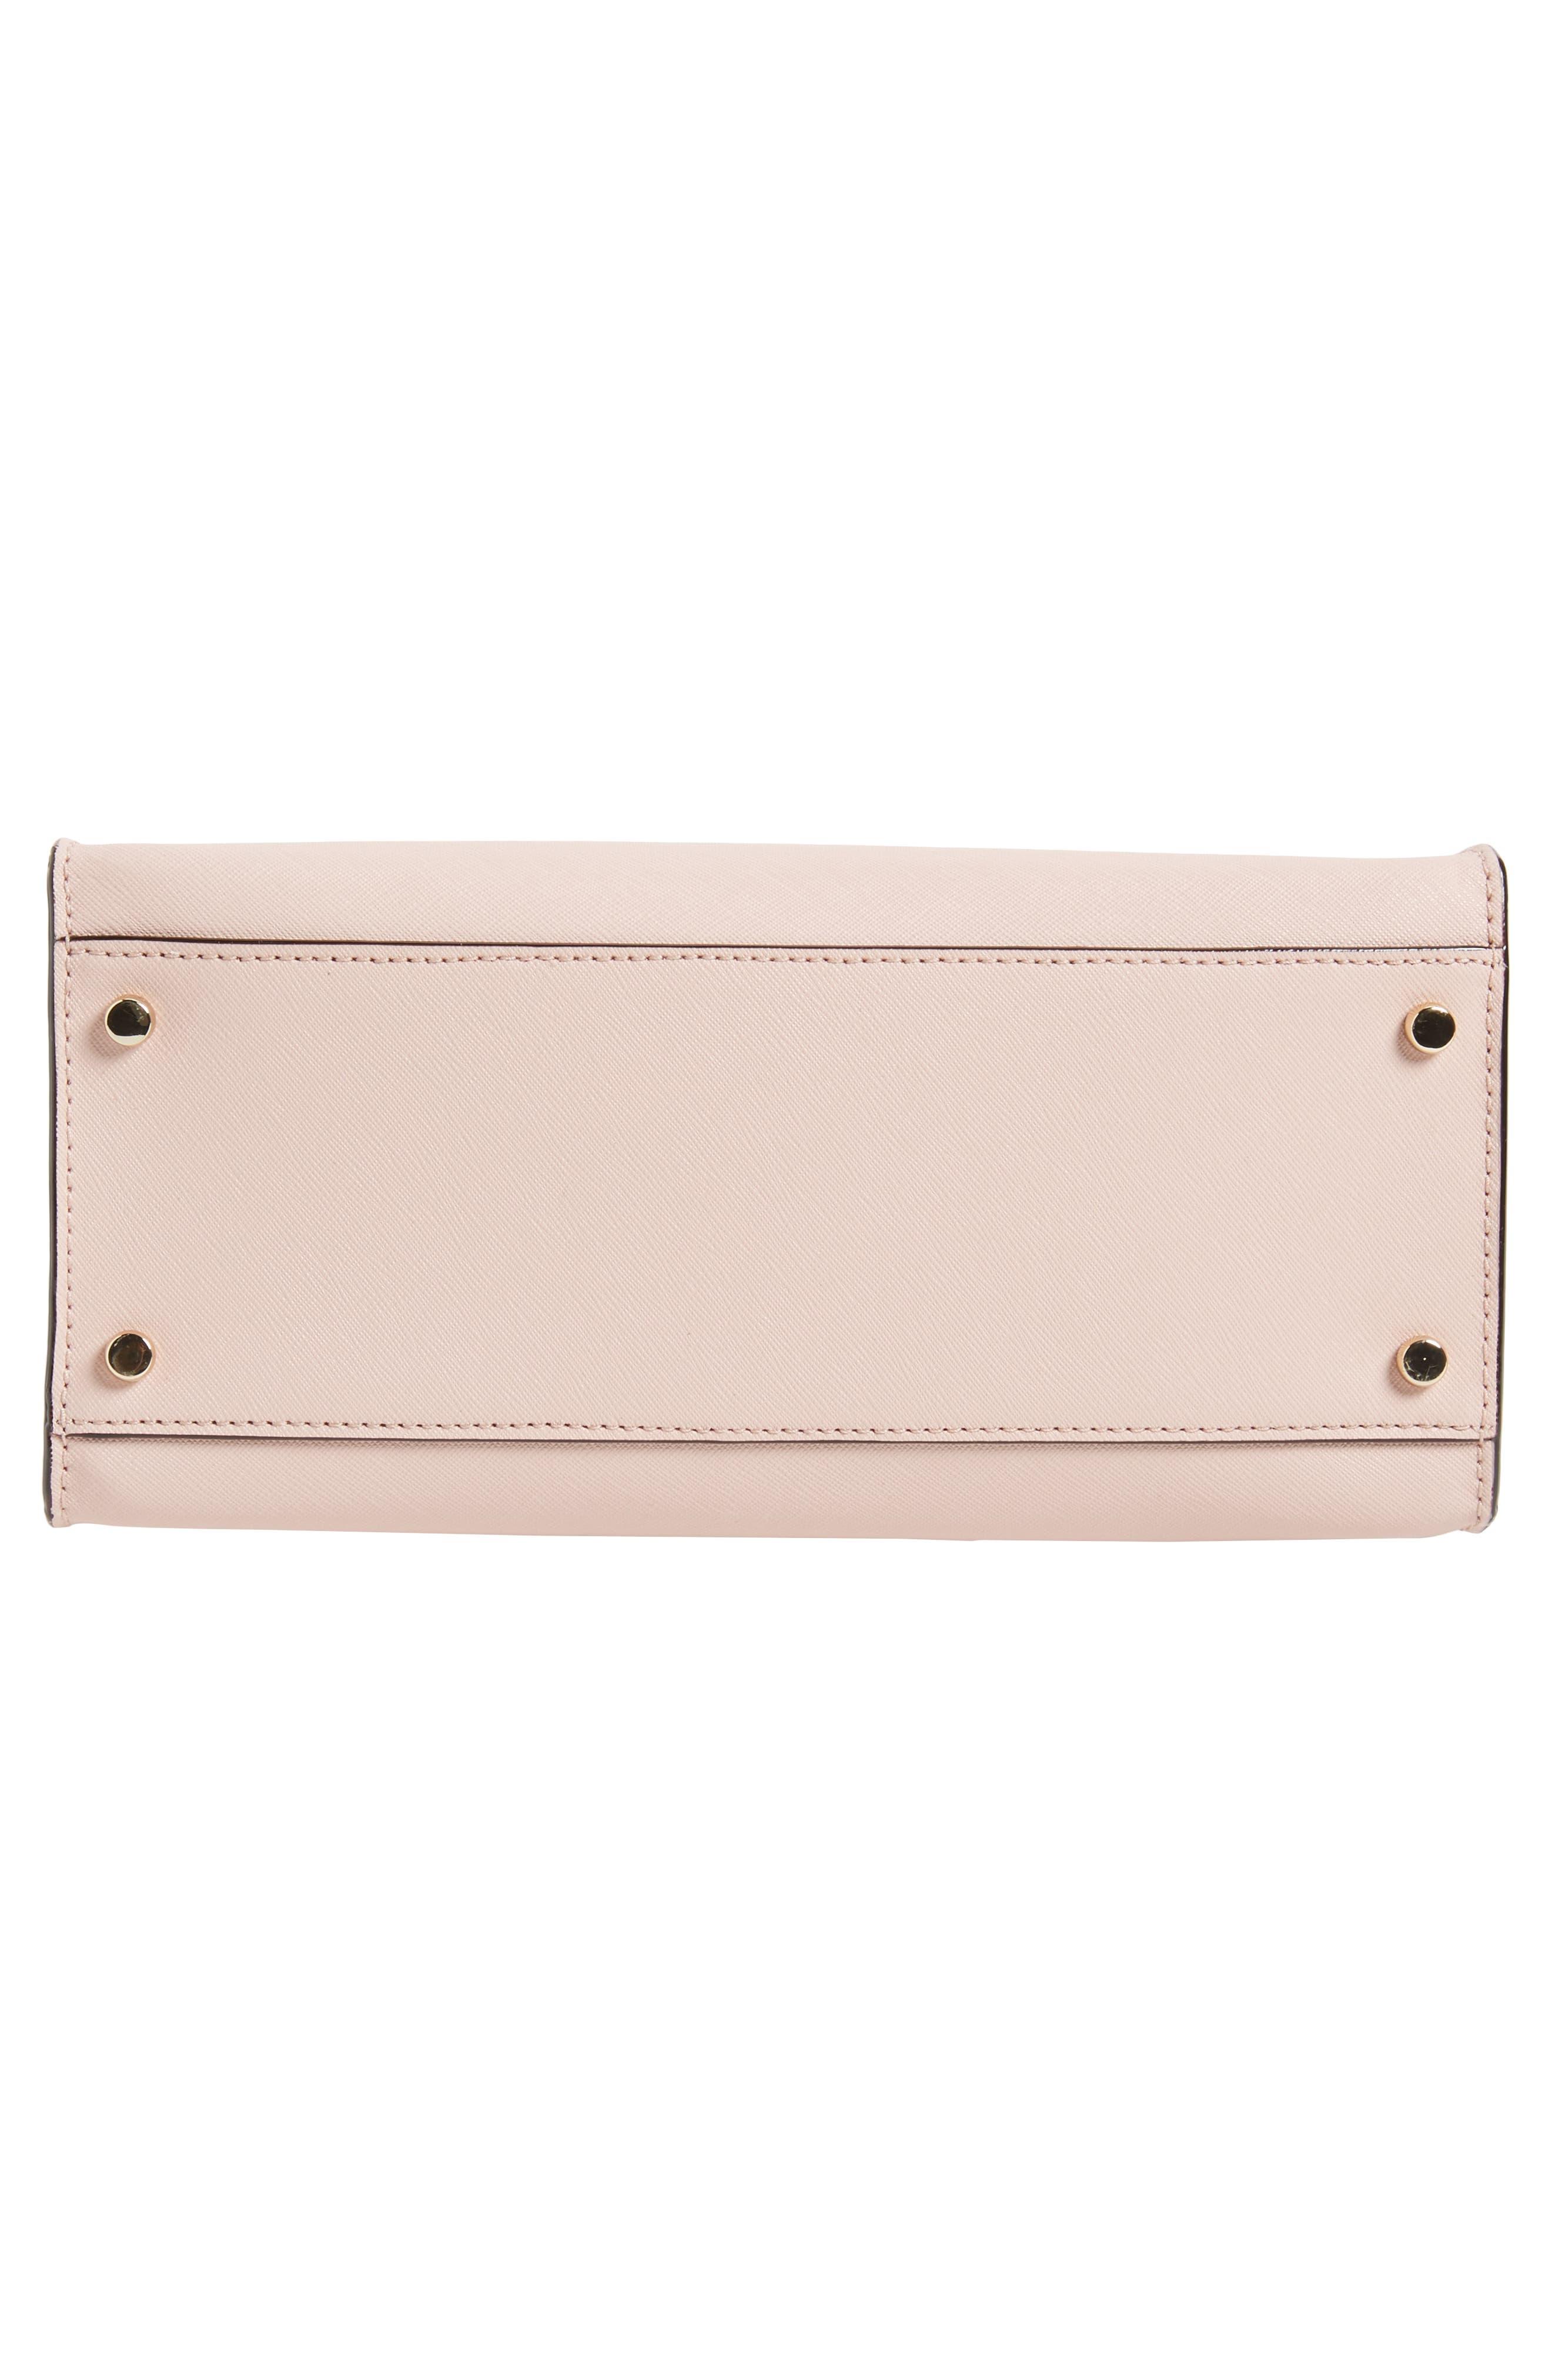 cameron street - sara leather satchel,                             Alternate thumbnail 6, color,                             Warm Vellum